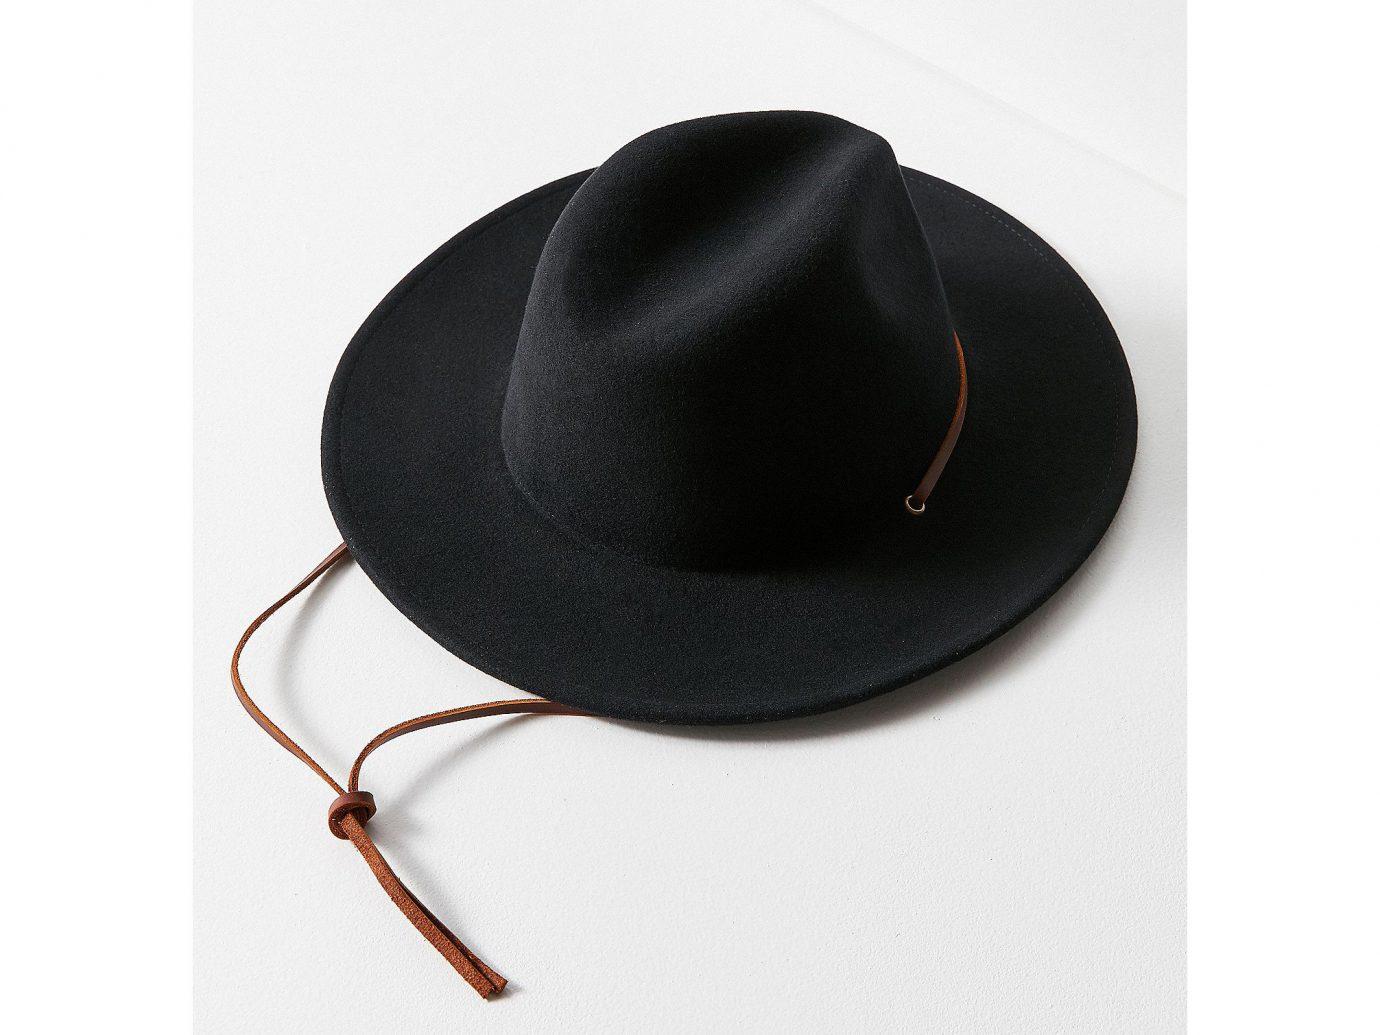 Outdoors + Adventure Trip Ideas headgear hat fashion accessory product design product